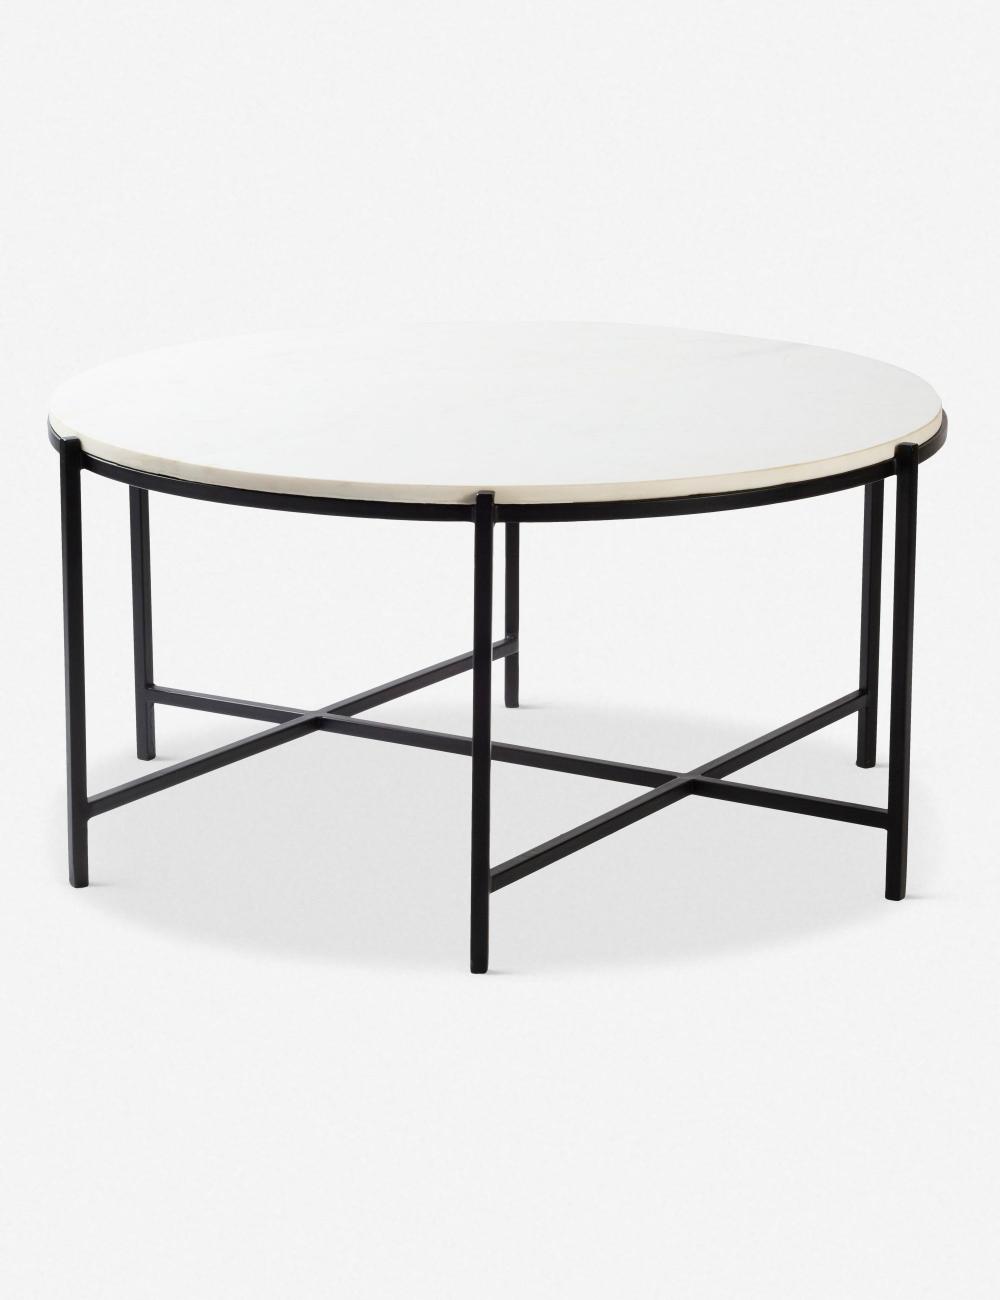 Berdina Round Coffee Table Coffee Table White Coffee Table Round Coffee Table [ 1300 x 1000 Pixel ]